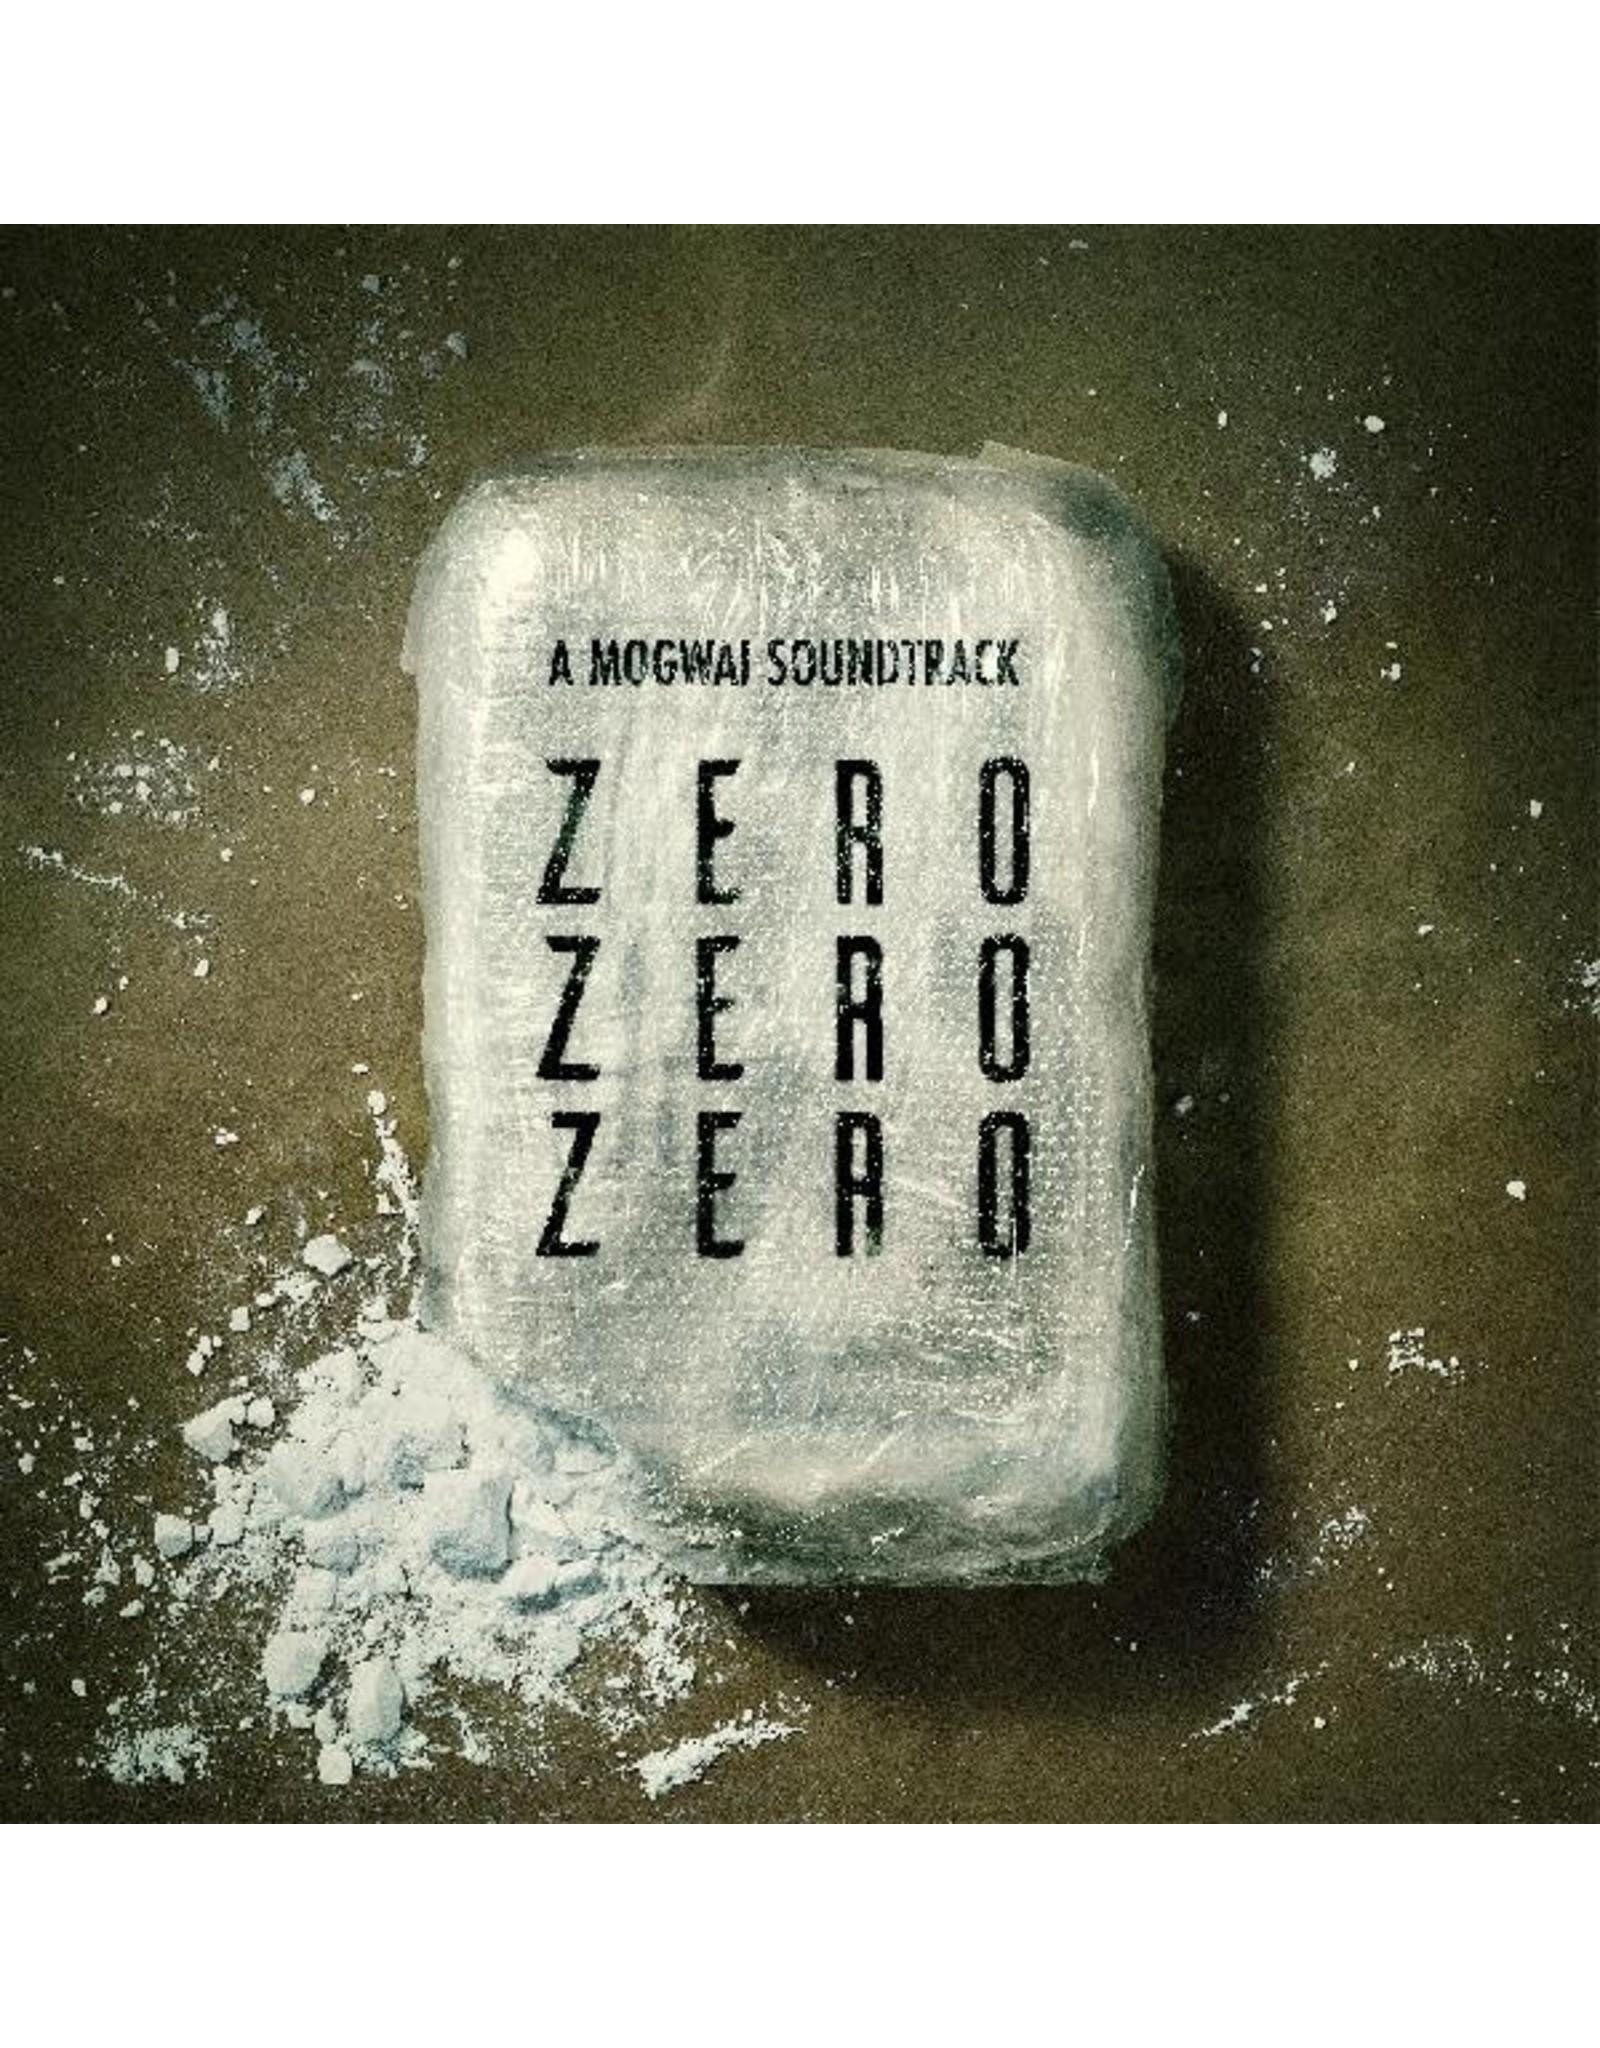 New Vinyl Mogwai - ZEROZEROZERO OST (White) 2LP